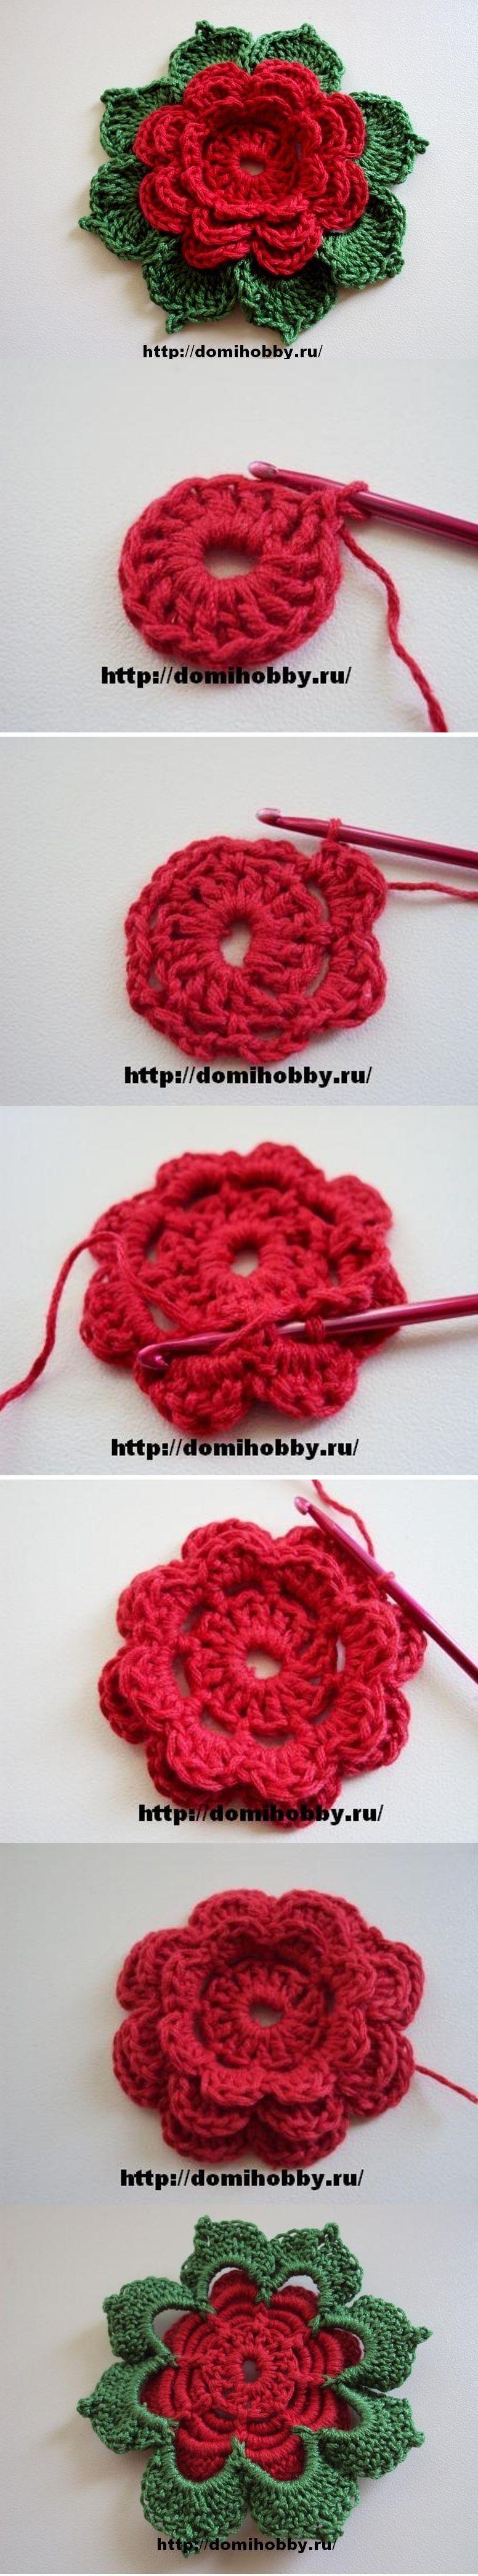 6a7219969ce0e3ae15be6aca8fa2175c.jpg 776×4,182 pixels | Crochet ...